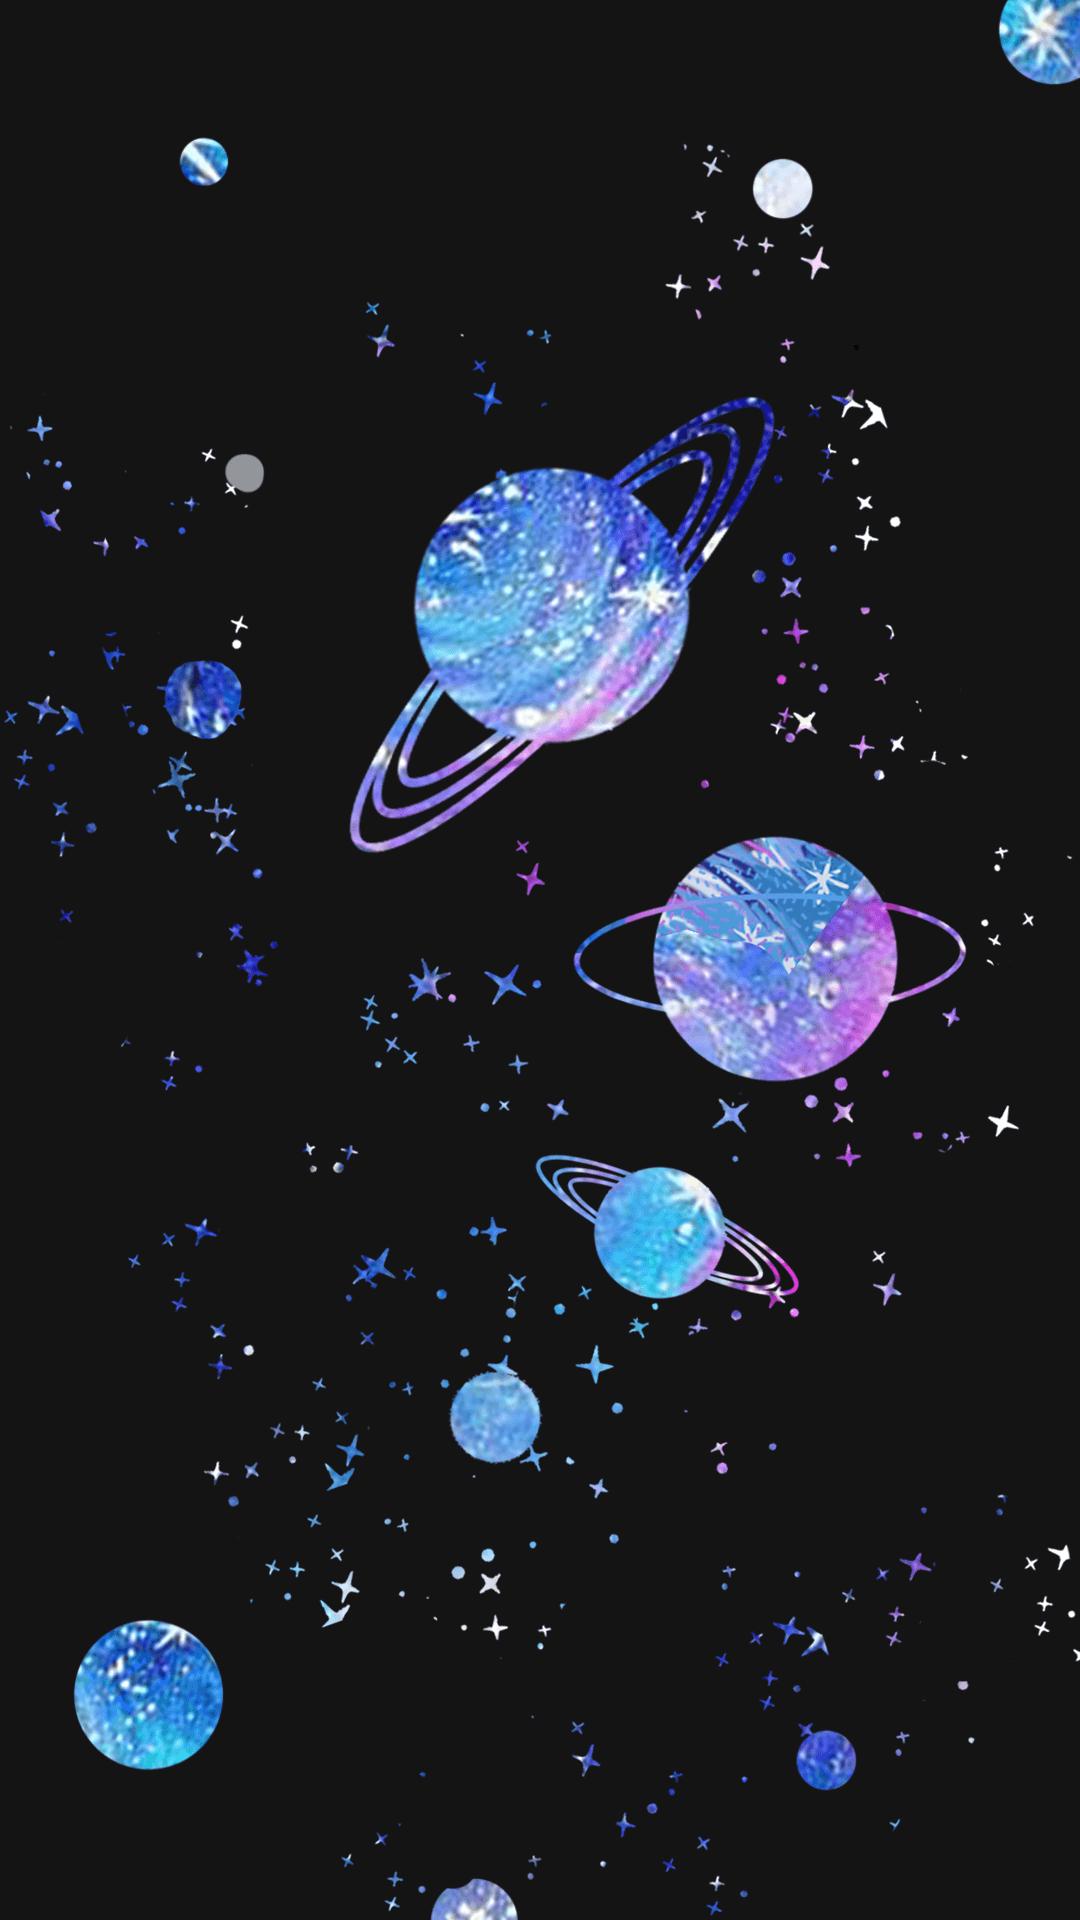 Space Aesthetic | Imagem De Fundo Para Iphone, Wallpaper